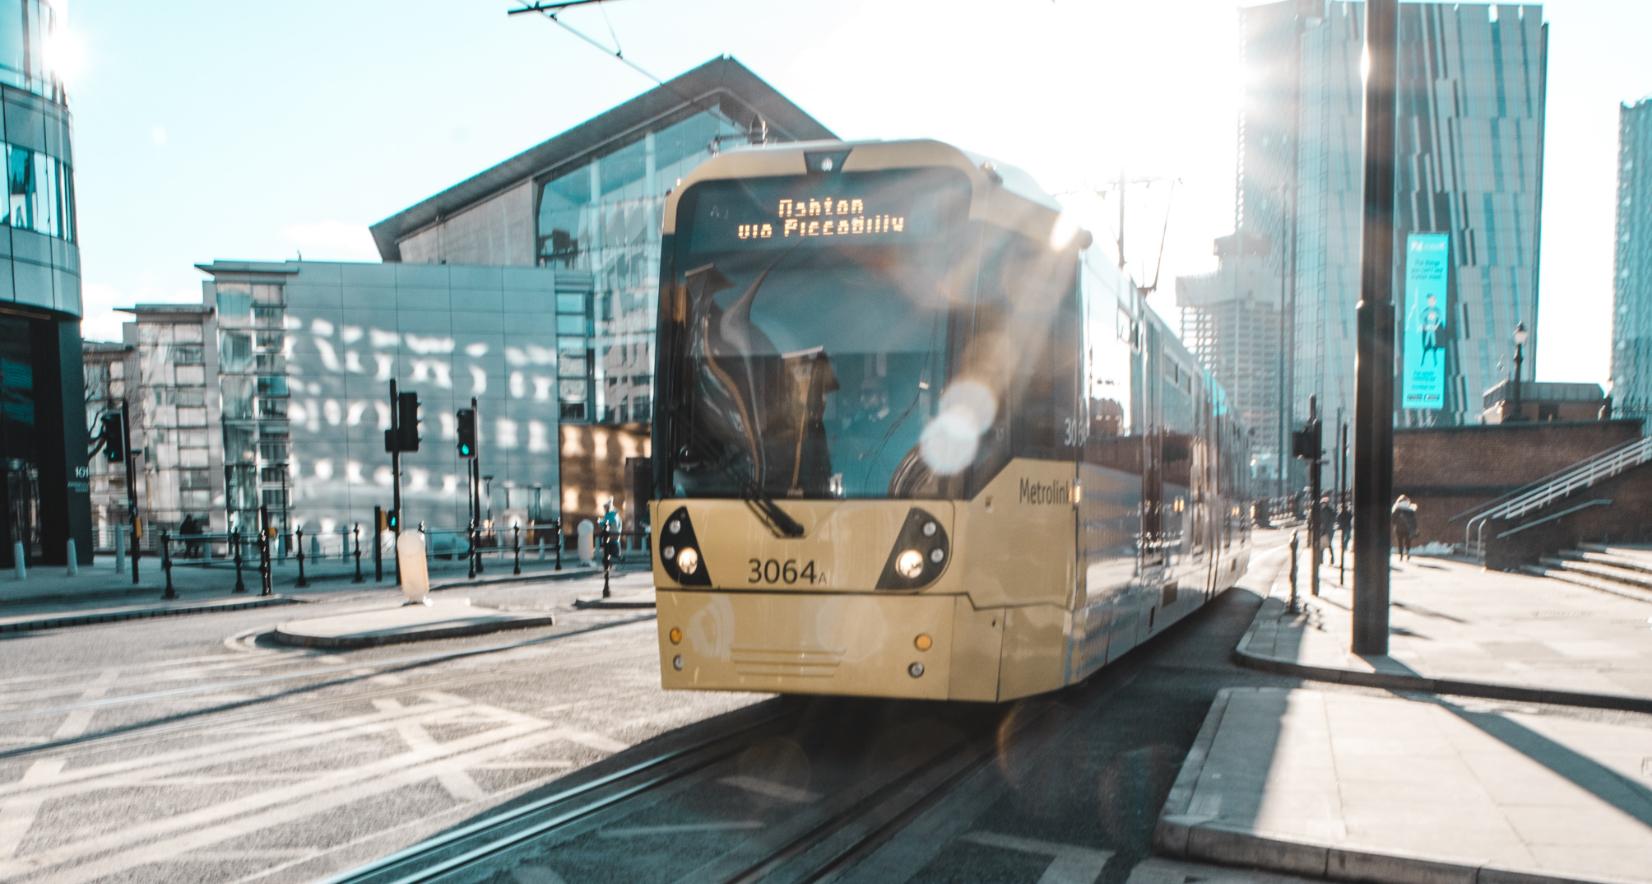 Tram - Unsplash